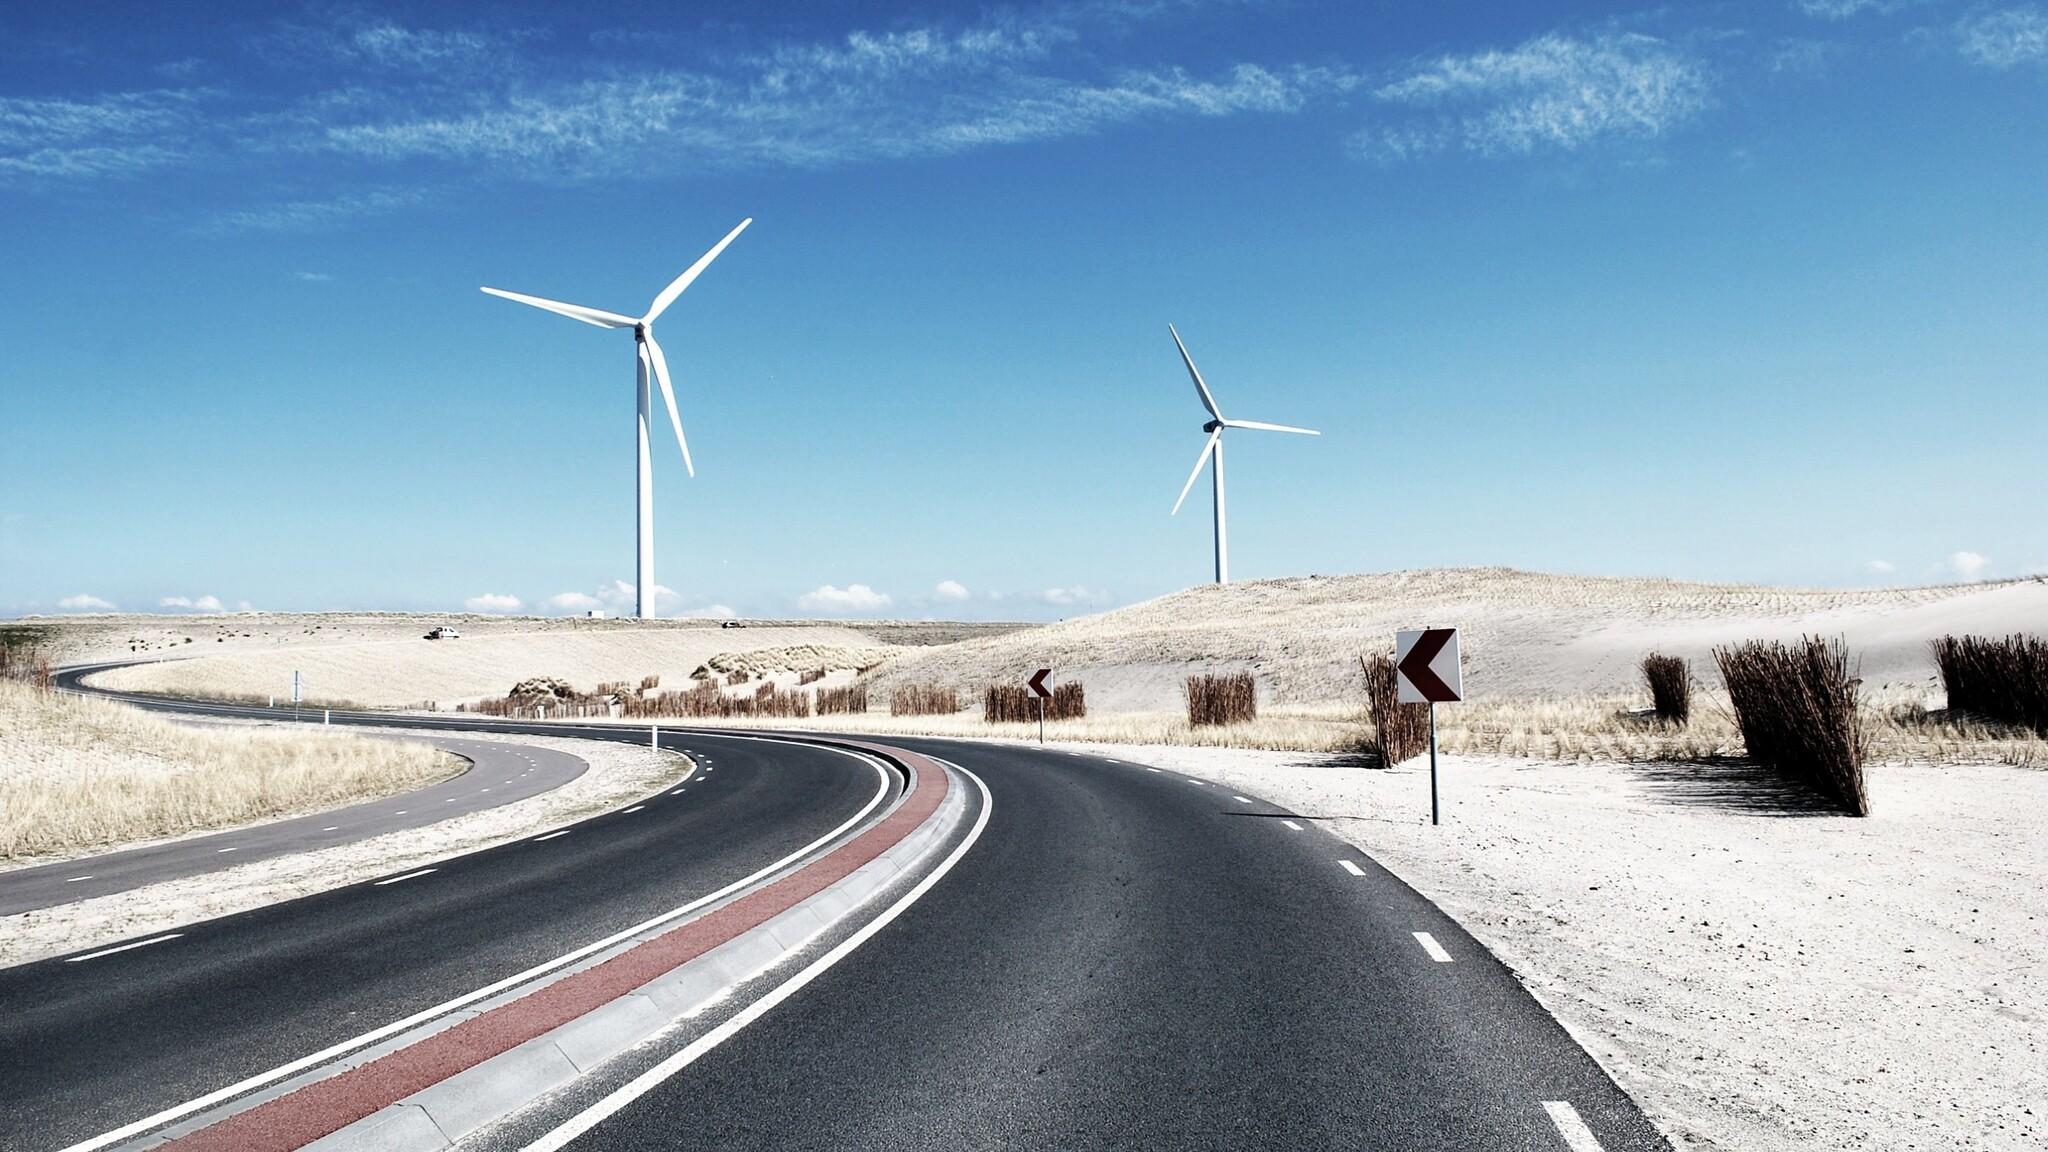 wind-turbine-landscape-nn.jpg